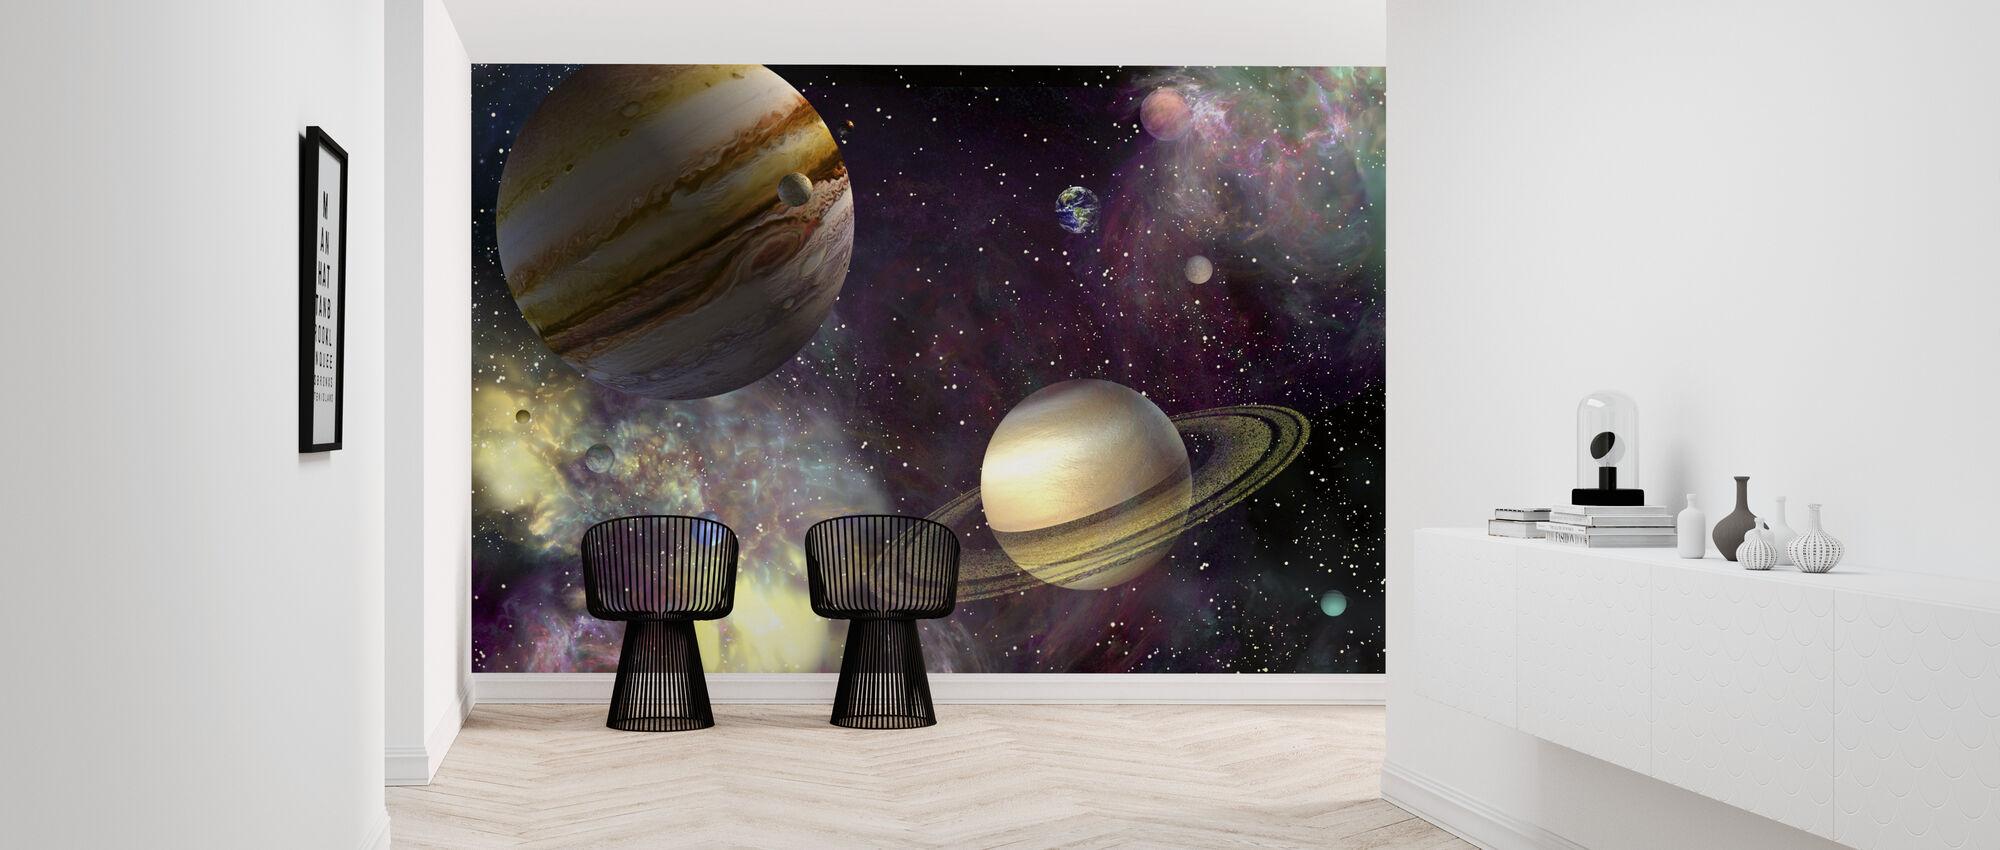 Our Solar System - Wallpaper - Hallway